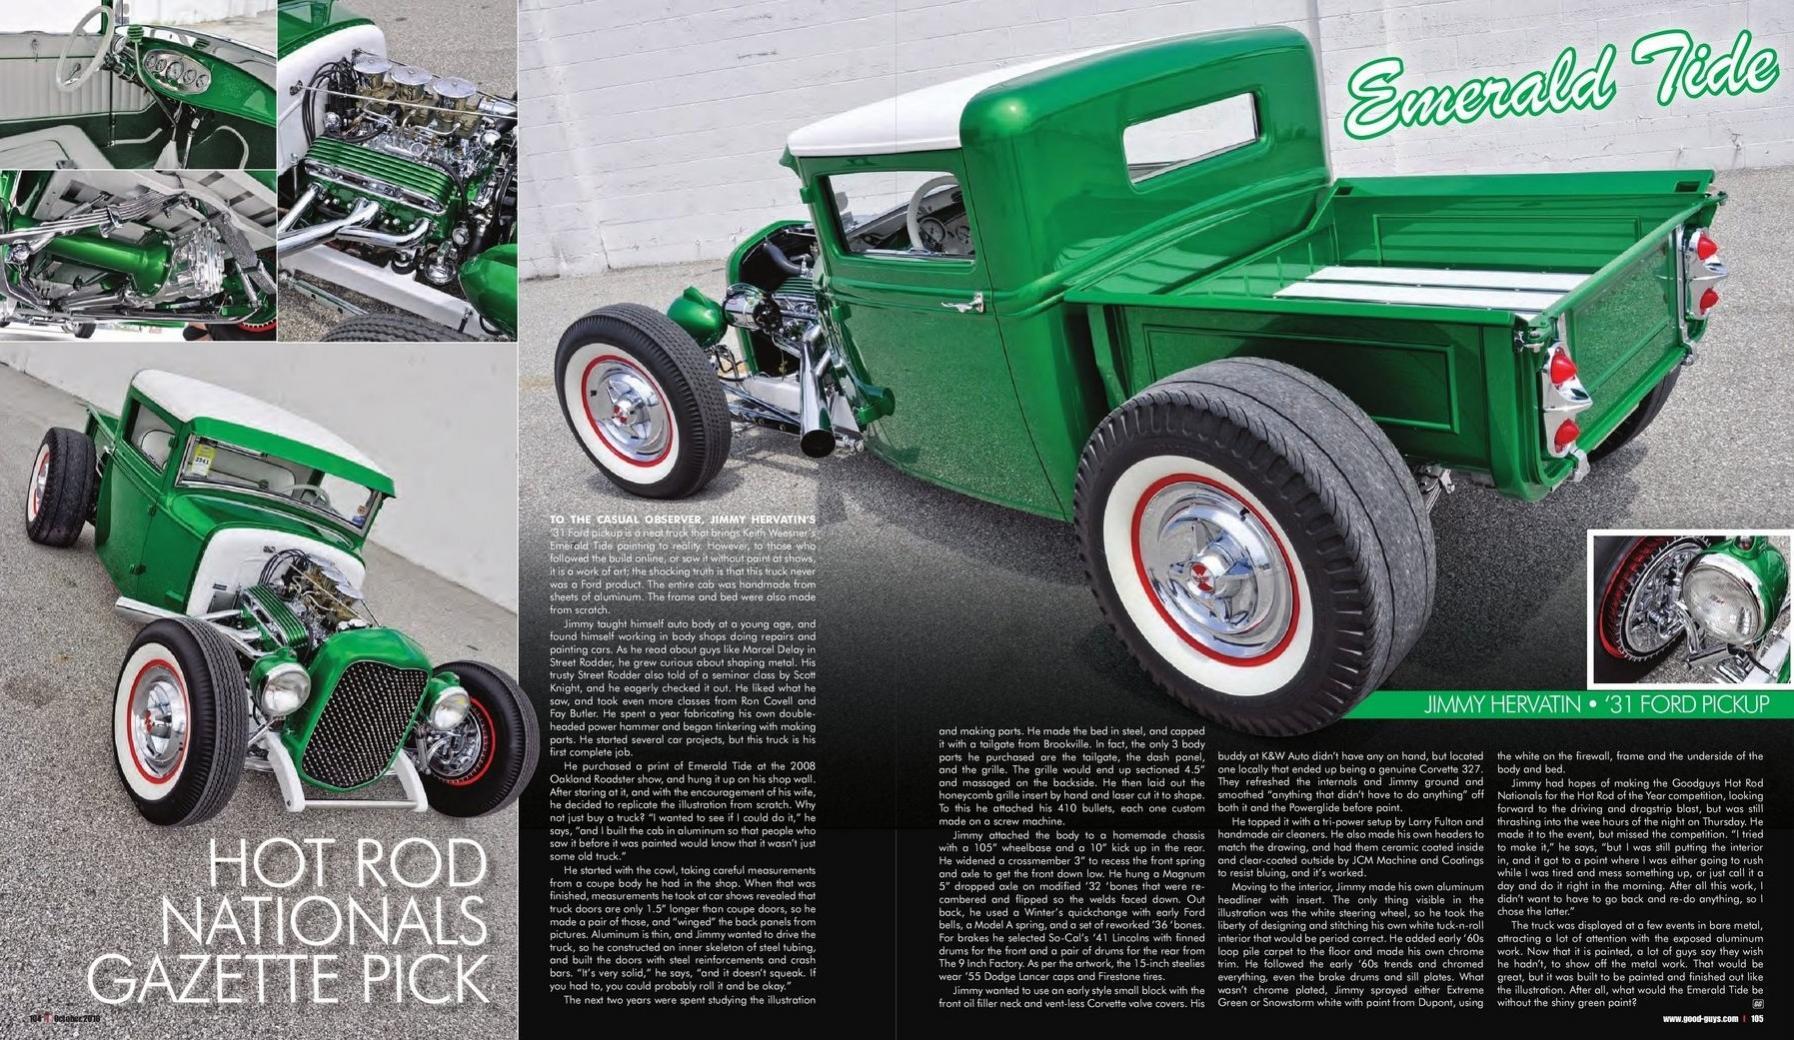 GOODGUYS Gazette - October 2010 - pages 104 & 105.jpg